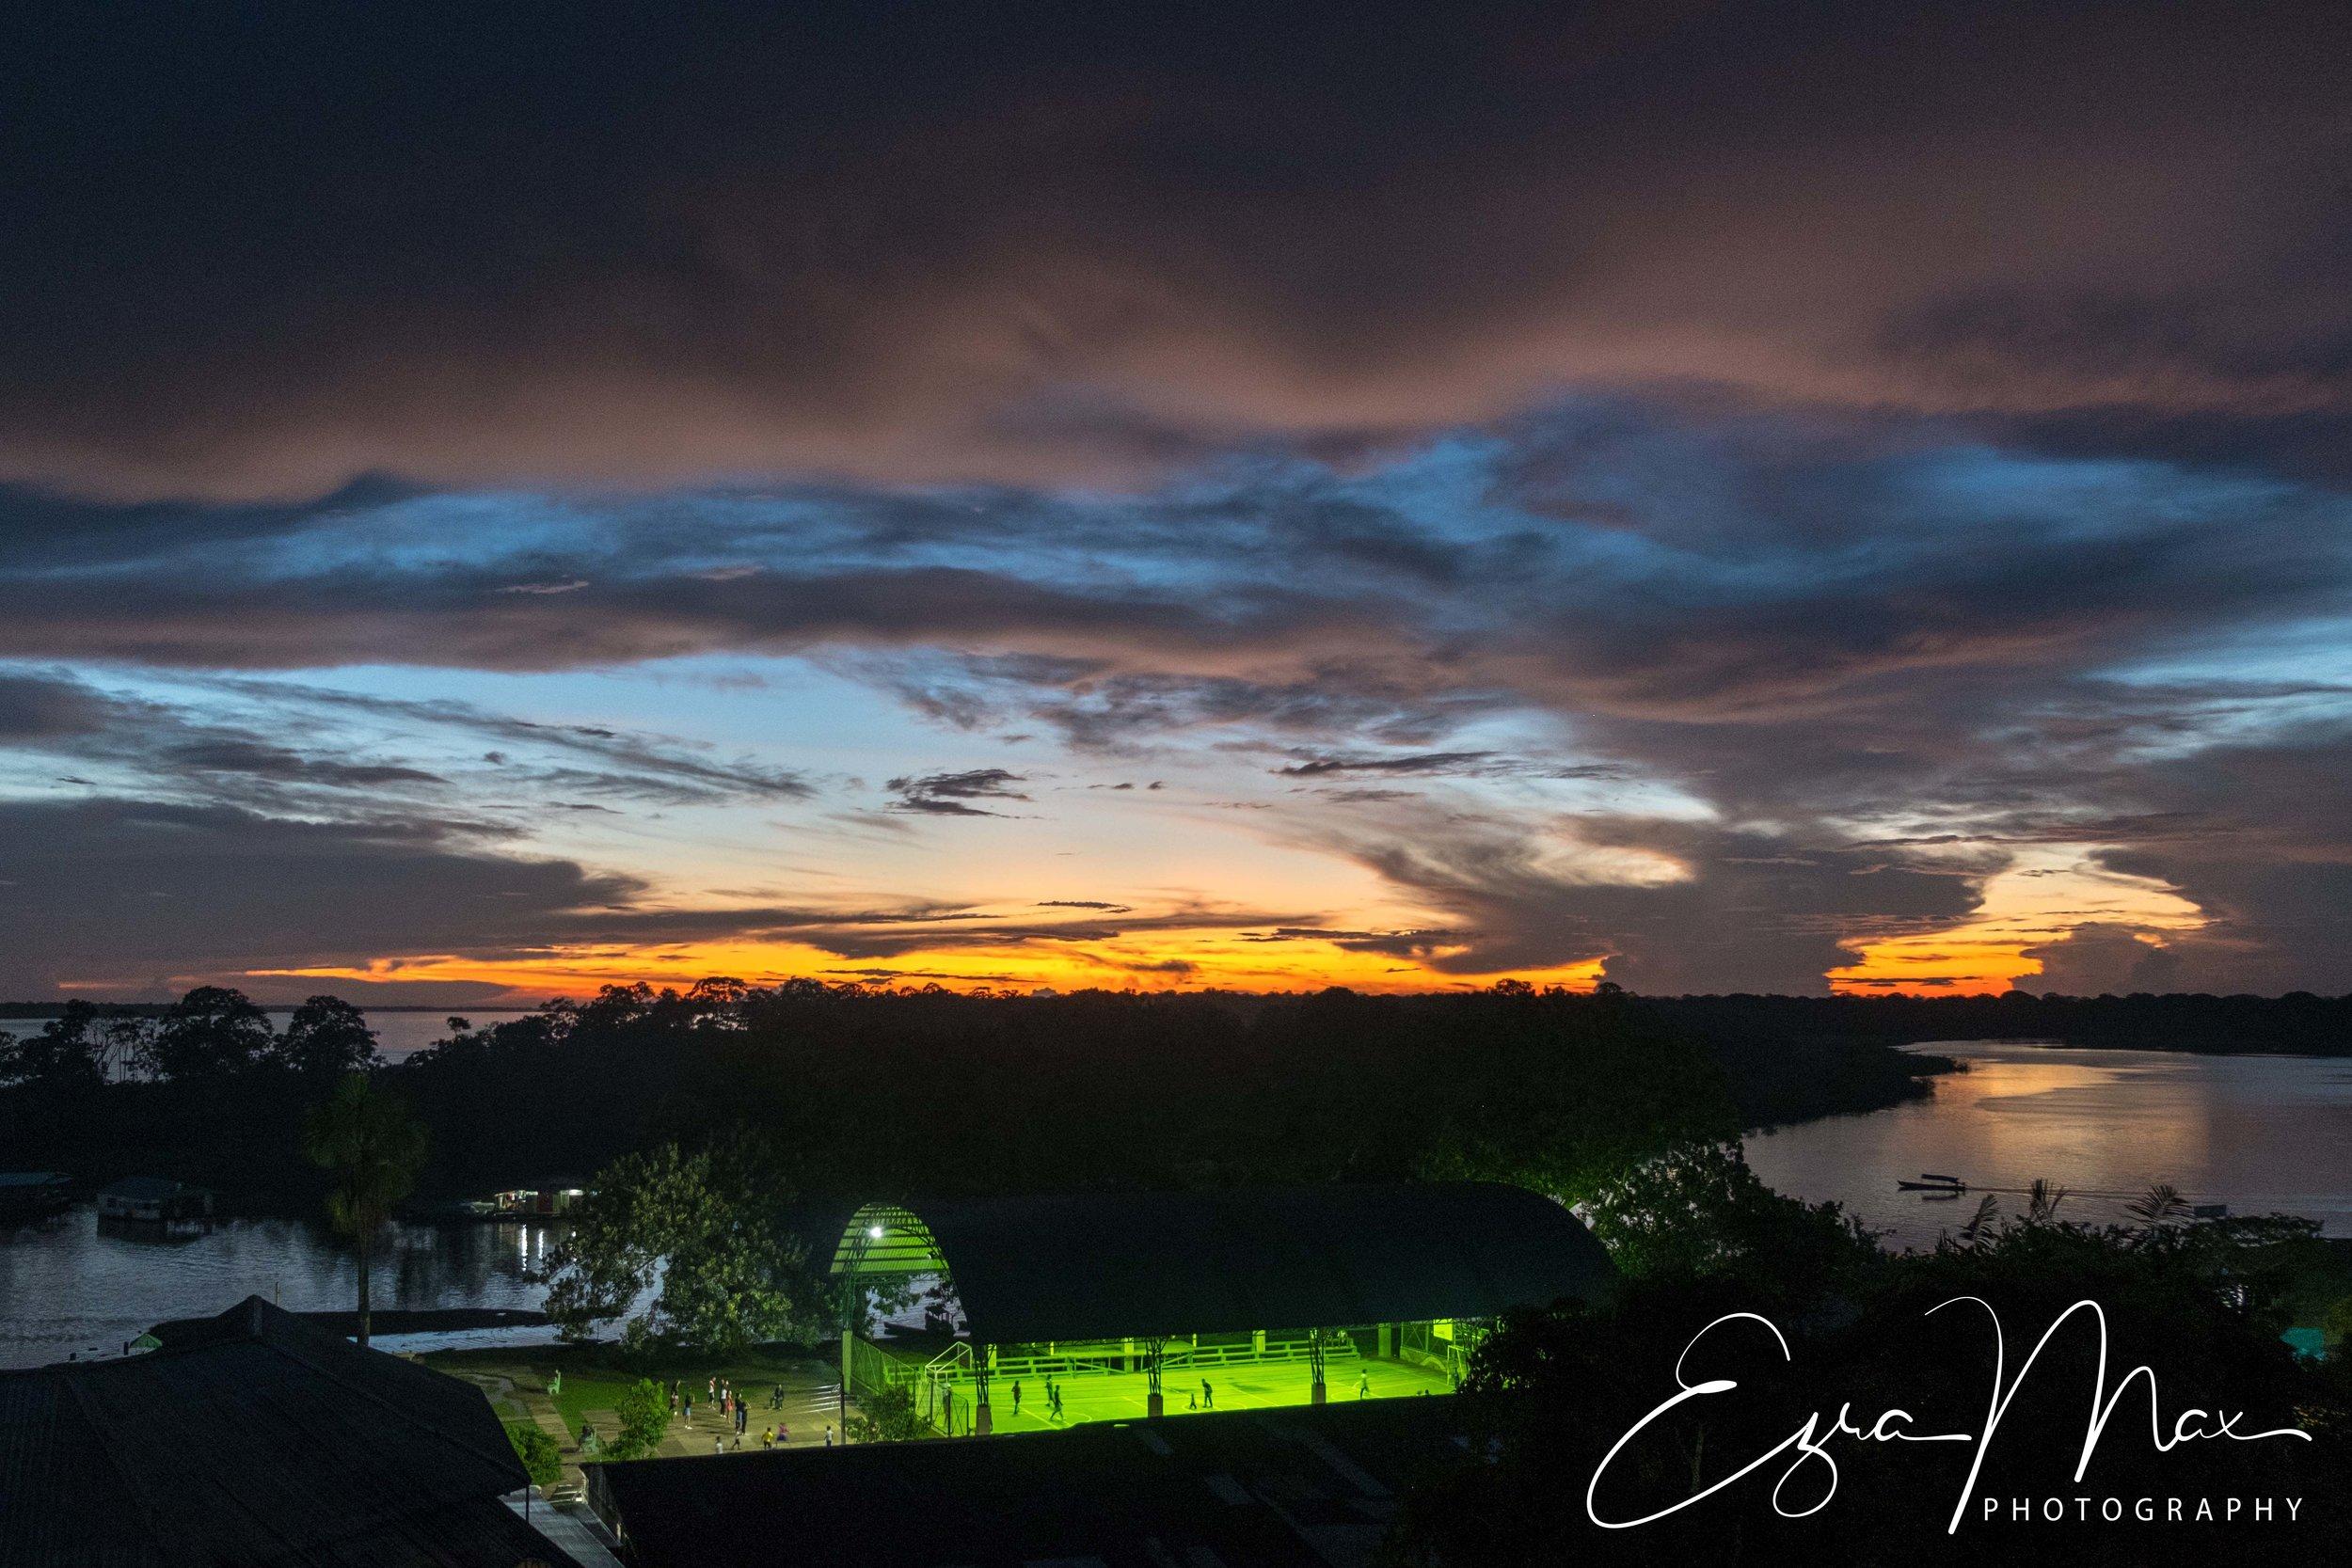 Sunset in Puerto Nariño